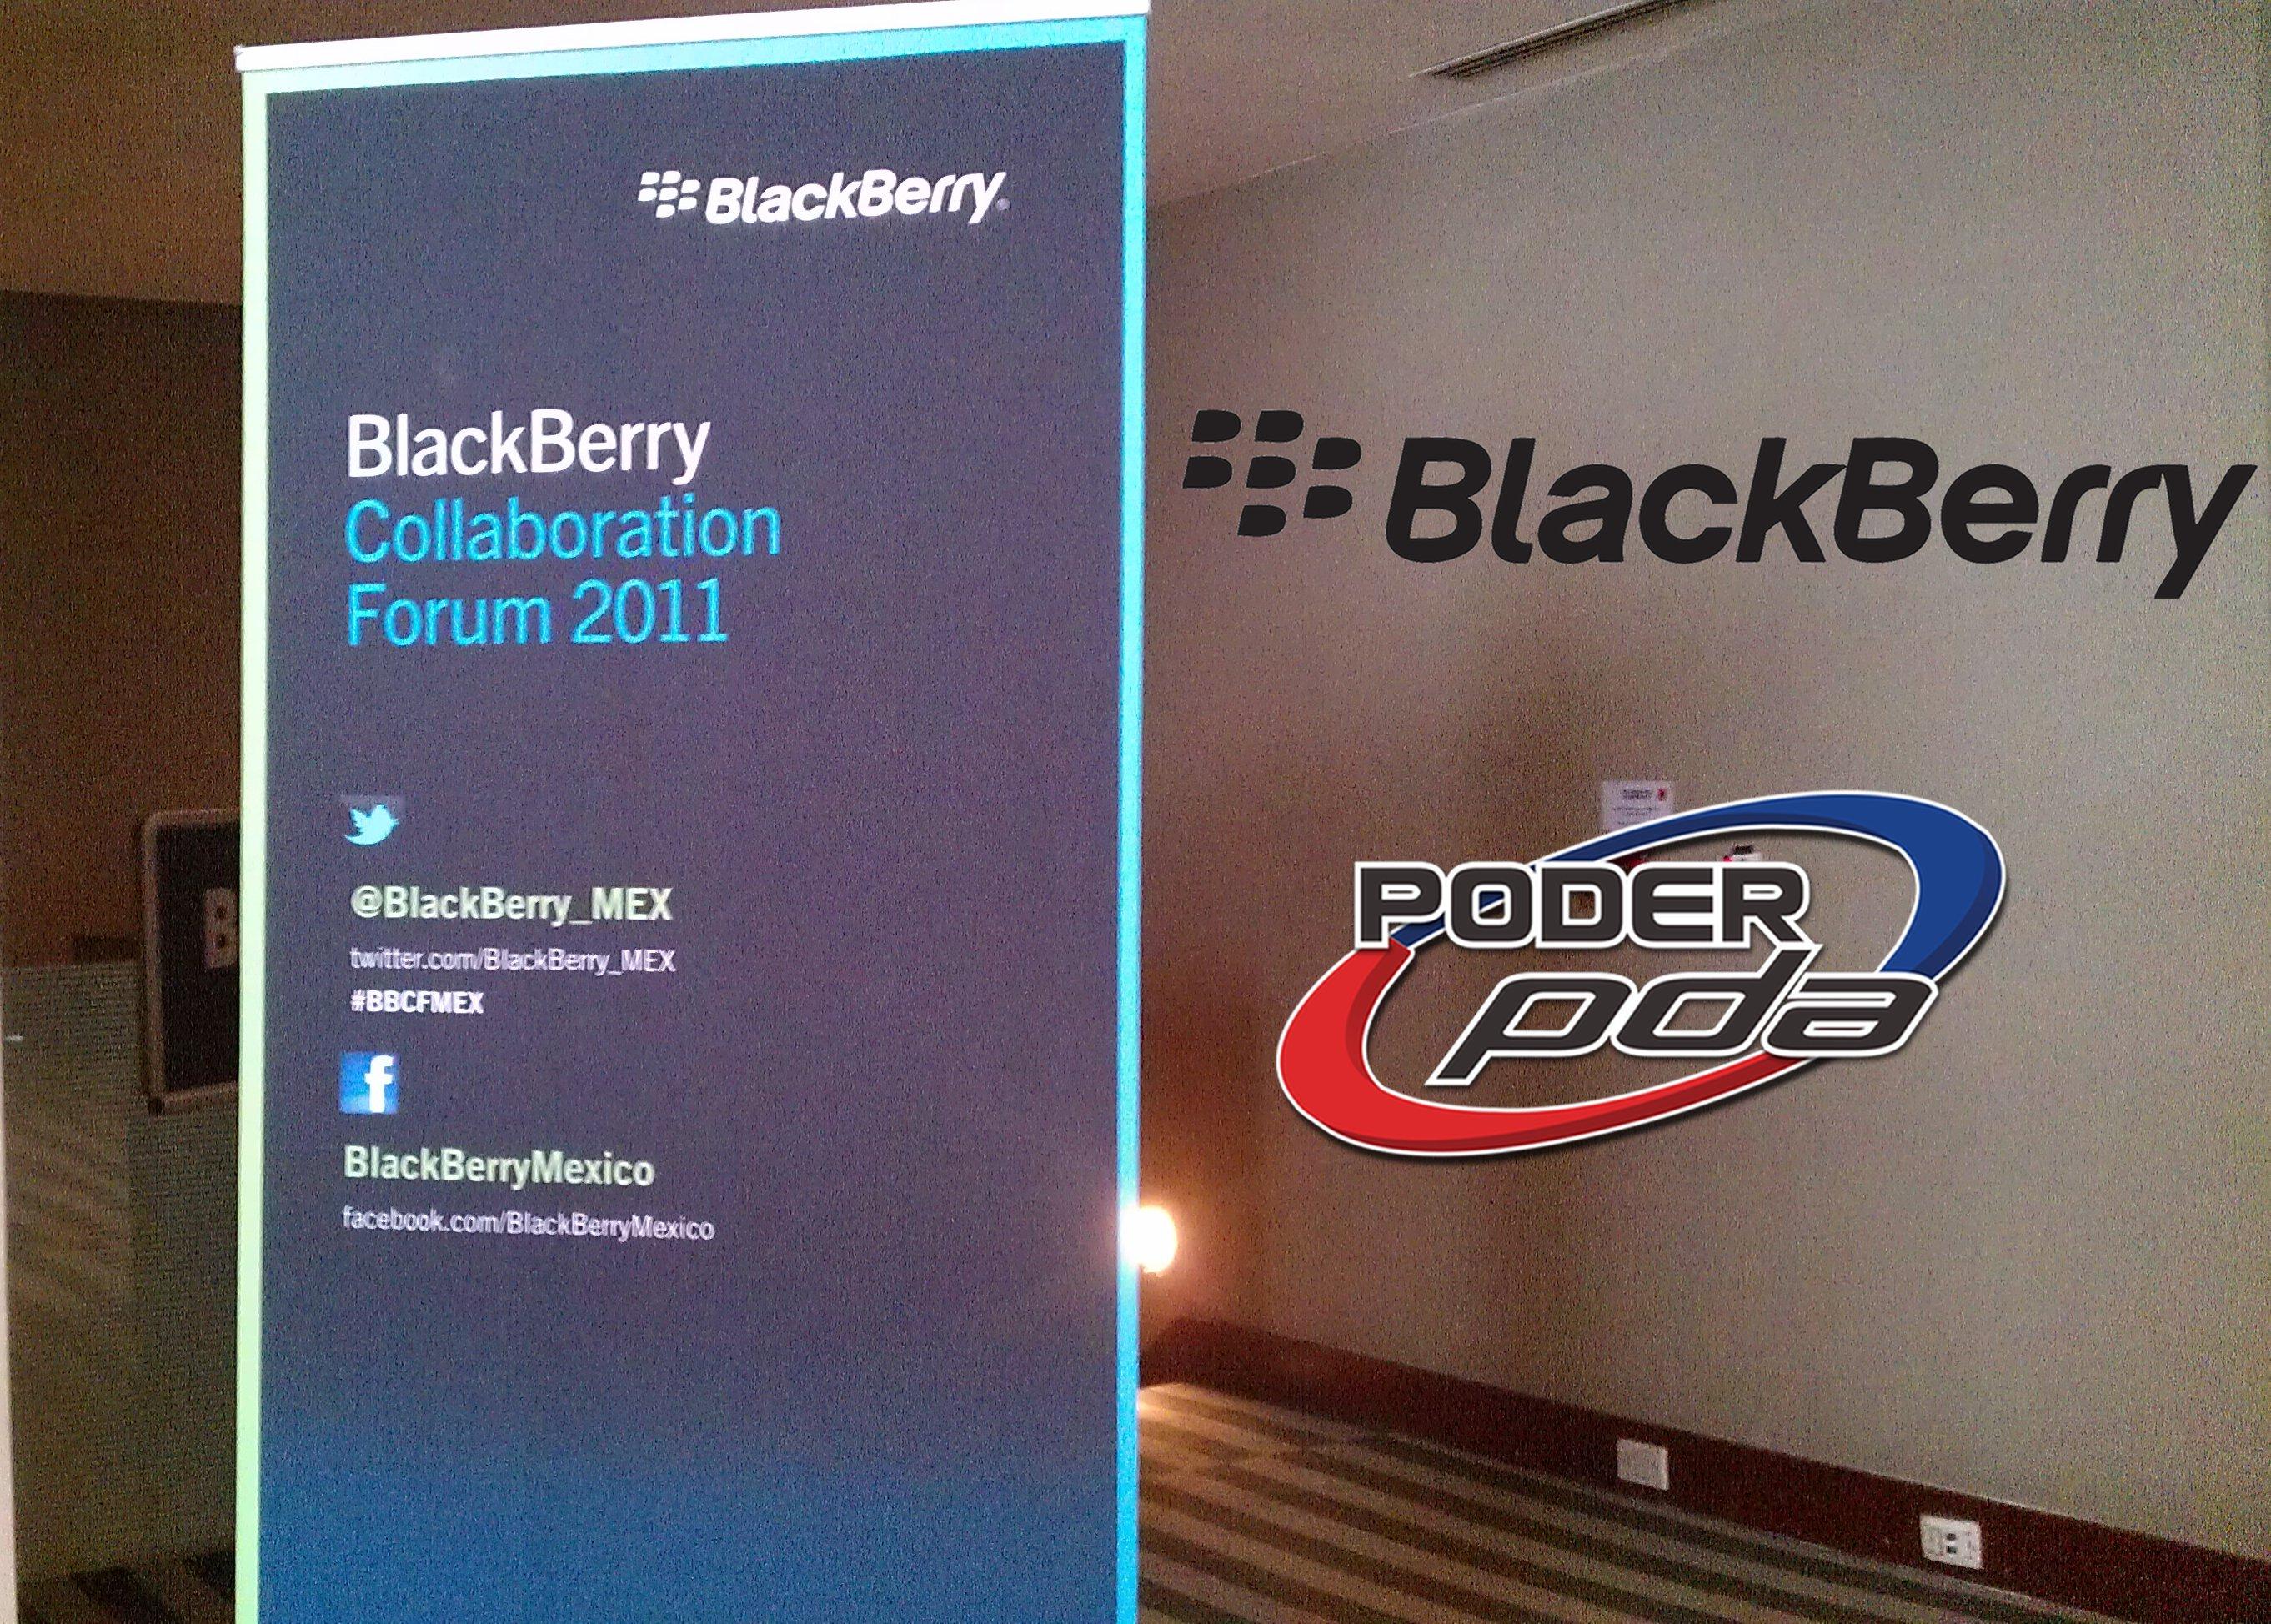 BlackBerry-Collaboration-Forum-2011-Mexico-Principal